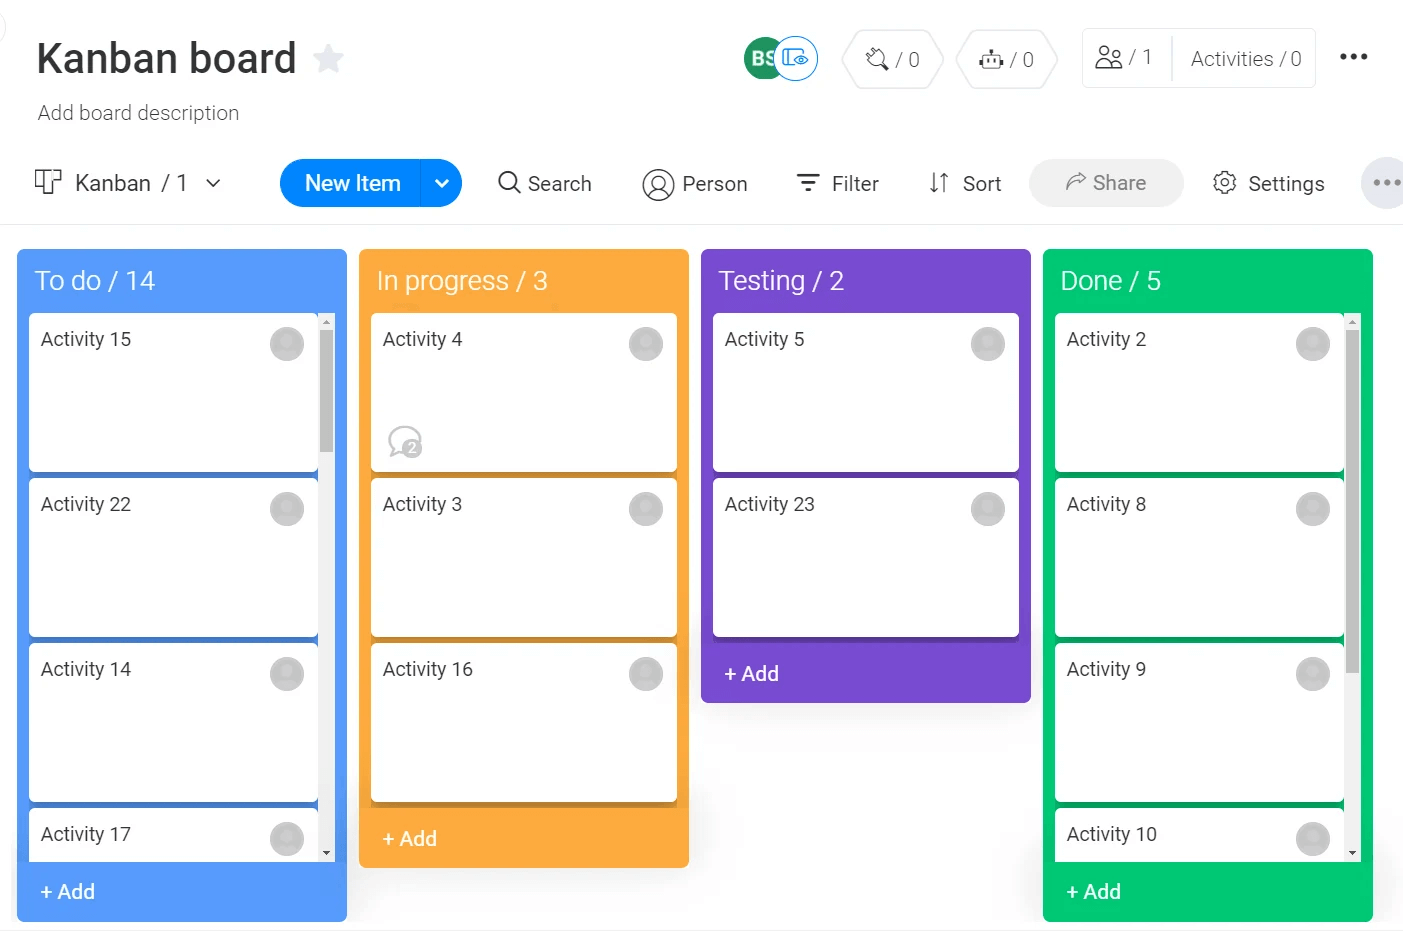 scrumban board monday.com kanban board template